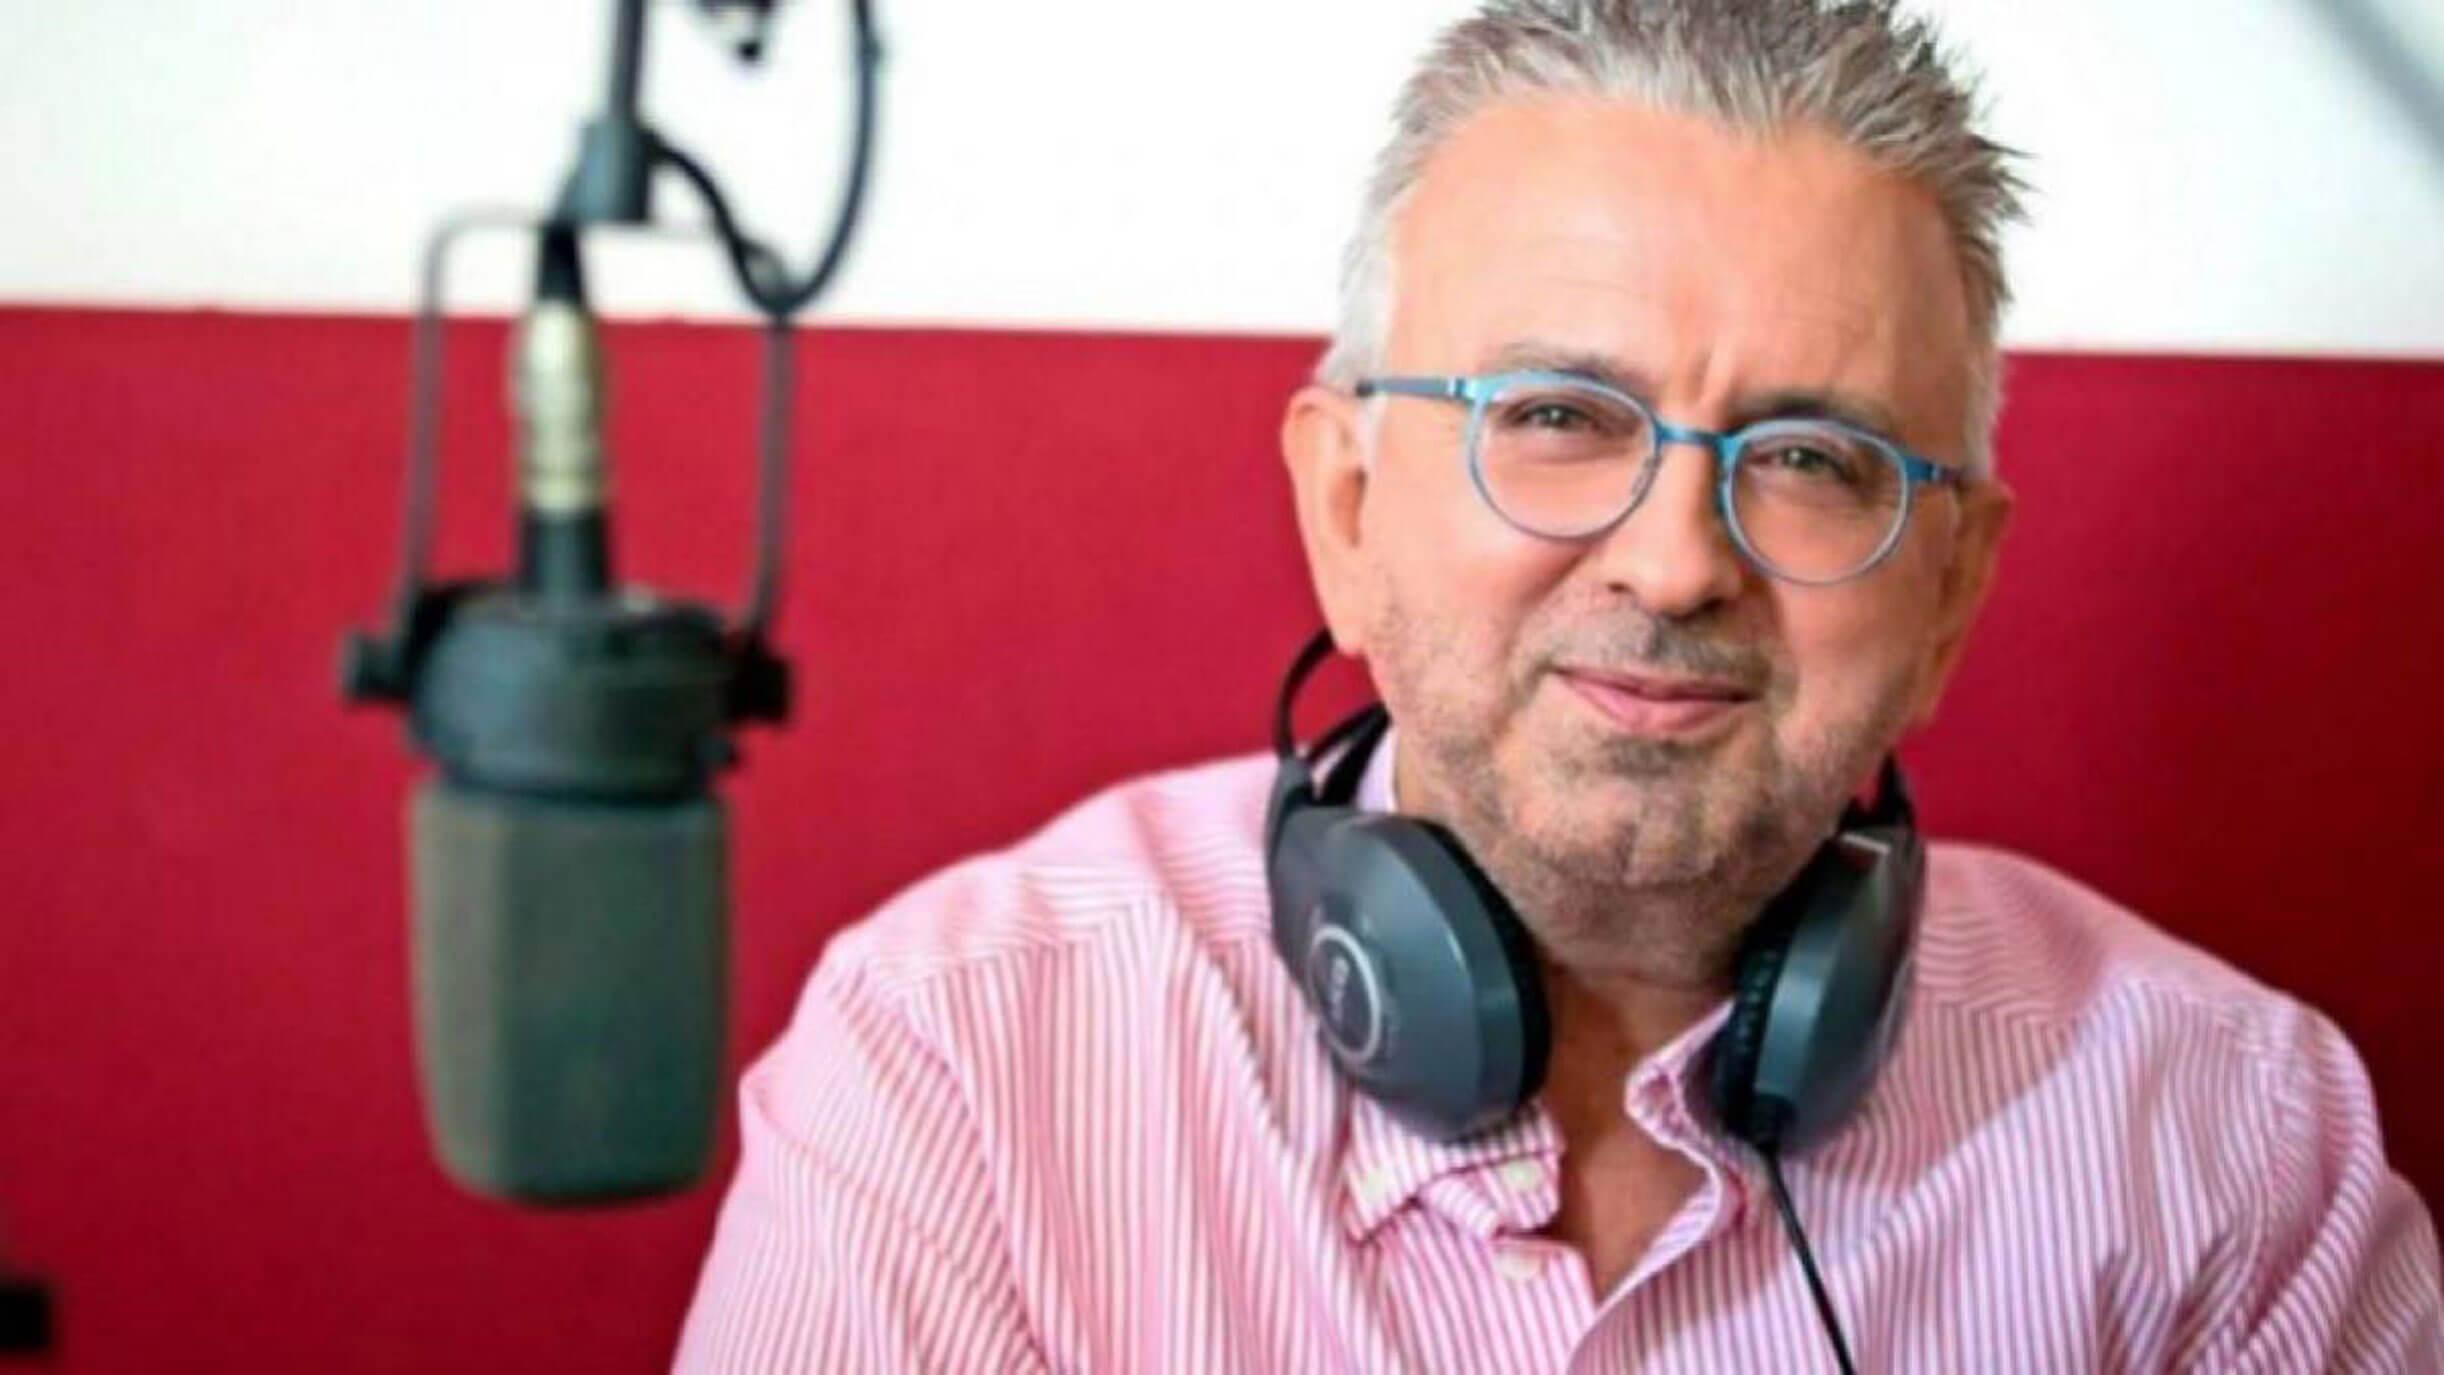 ALPHA: Εκτός ο Δήμος Βερύκιος – Αλλαγές στη διοίκηση | Newsit.gr